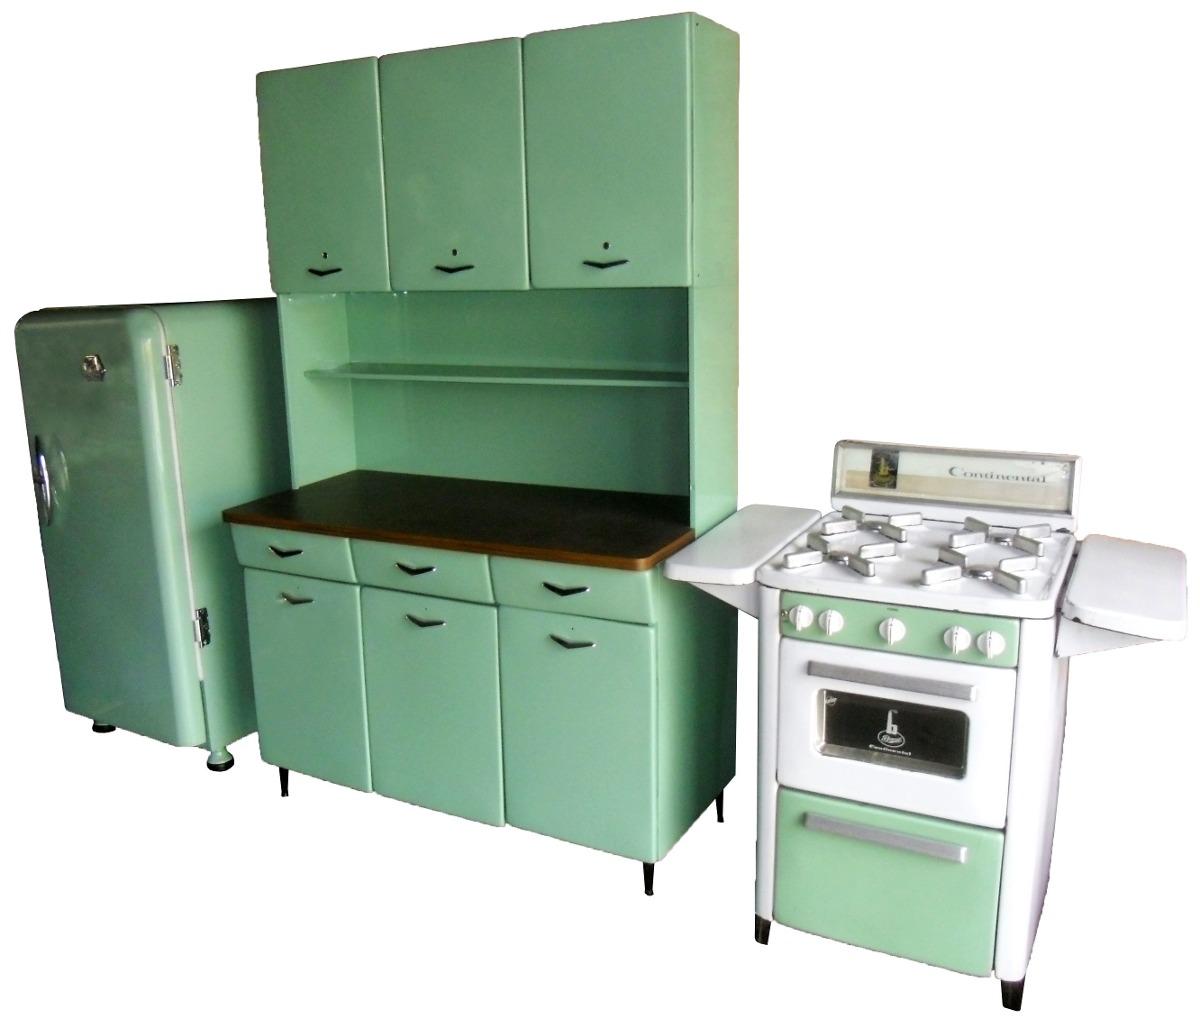 mesma tonalidade de verde (da época '60s) funcionamento para uso #478458 1200 1027